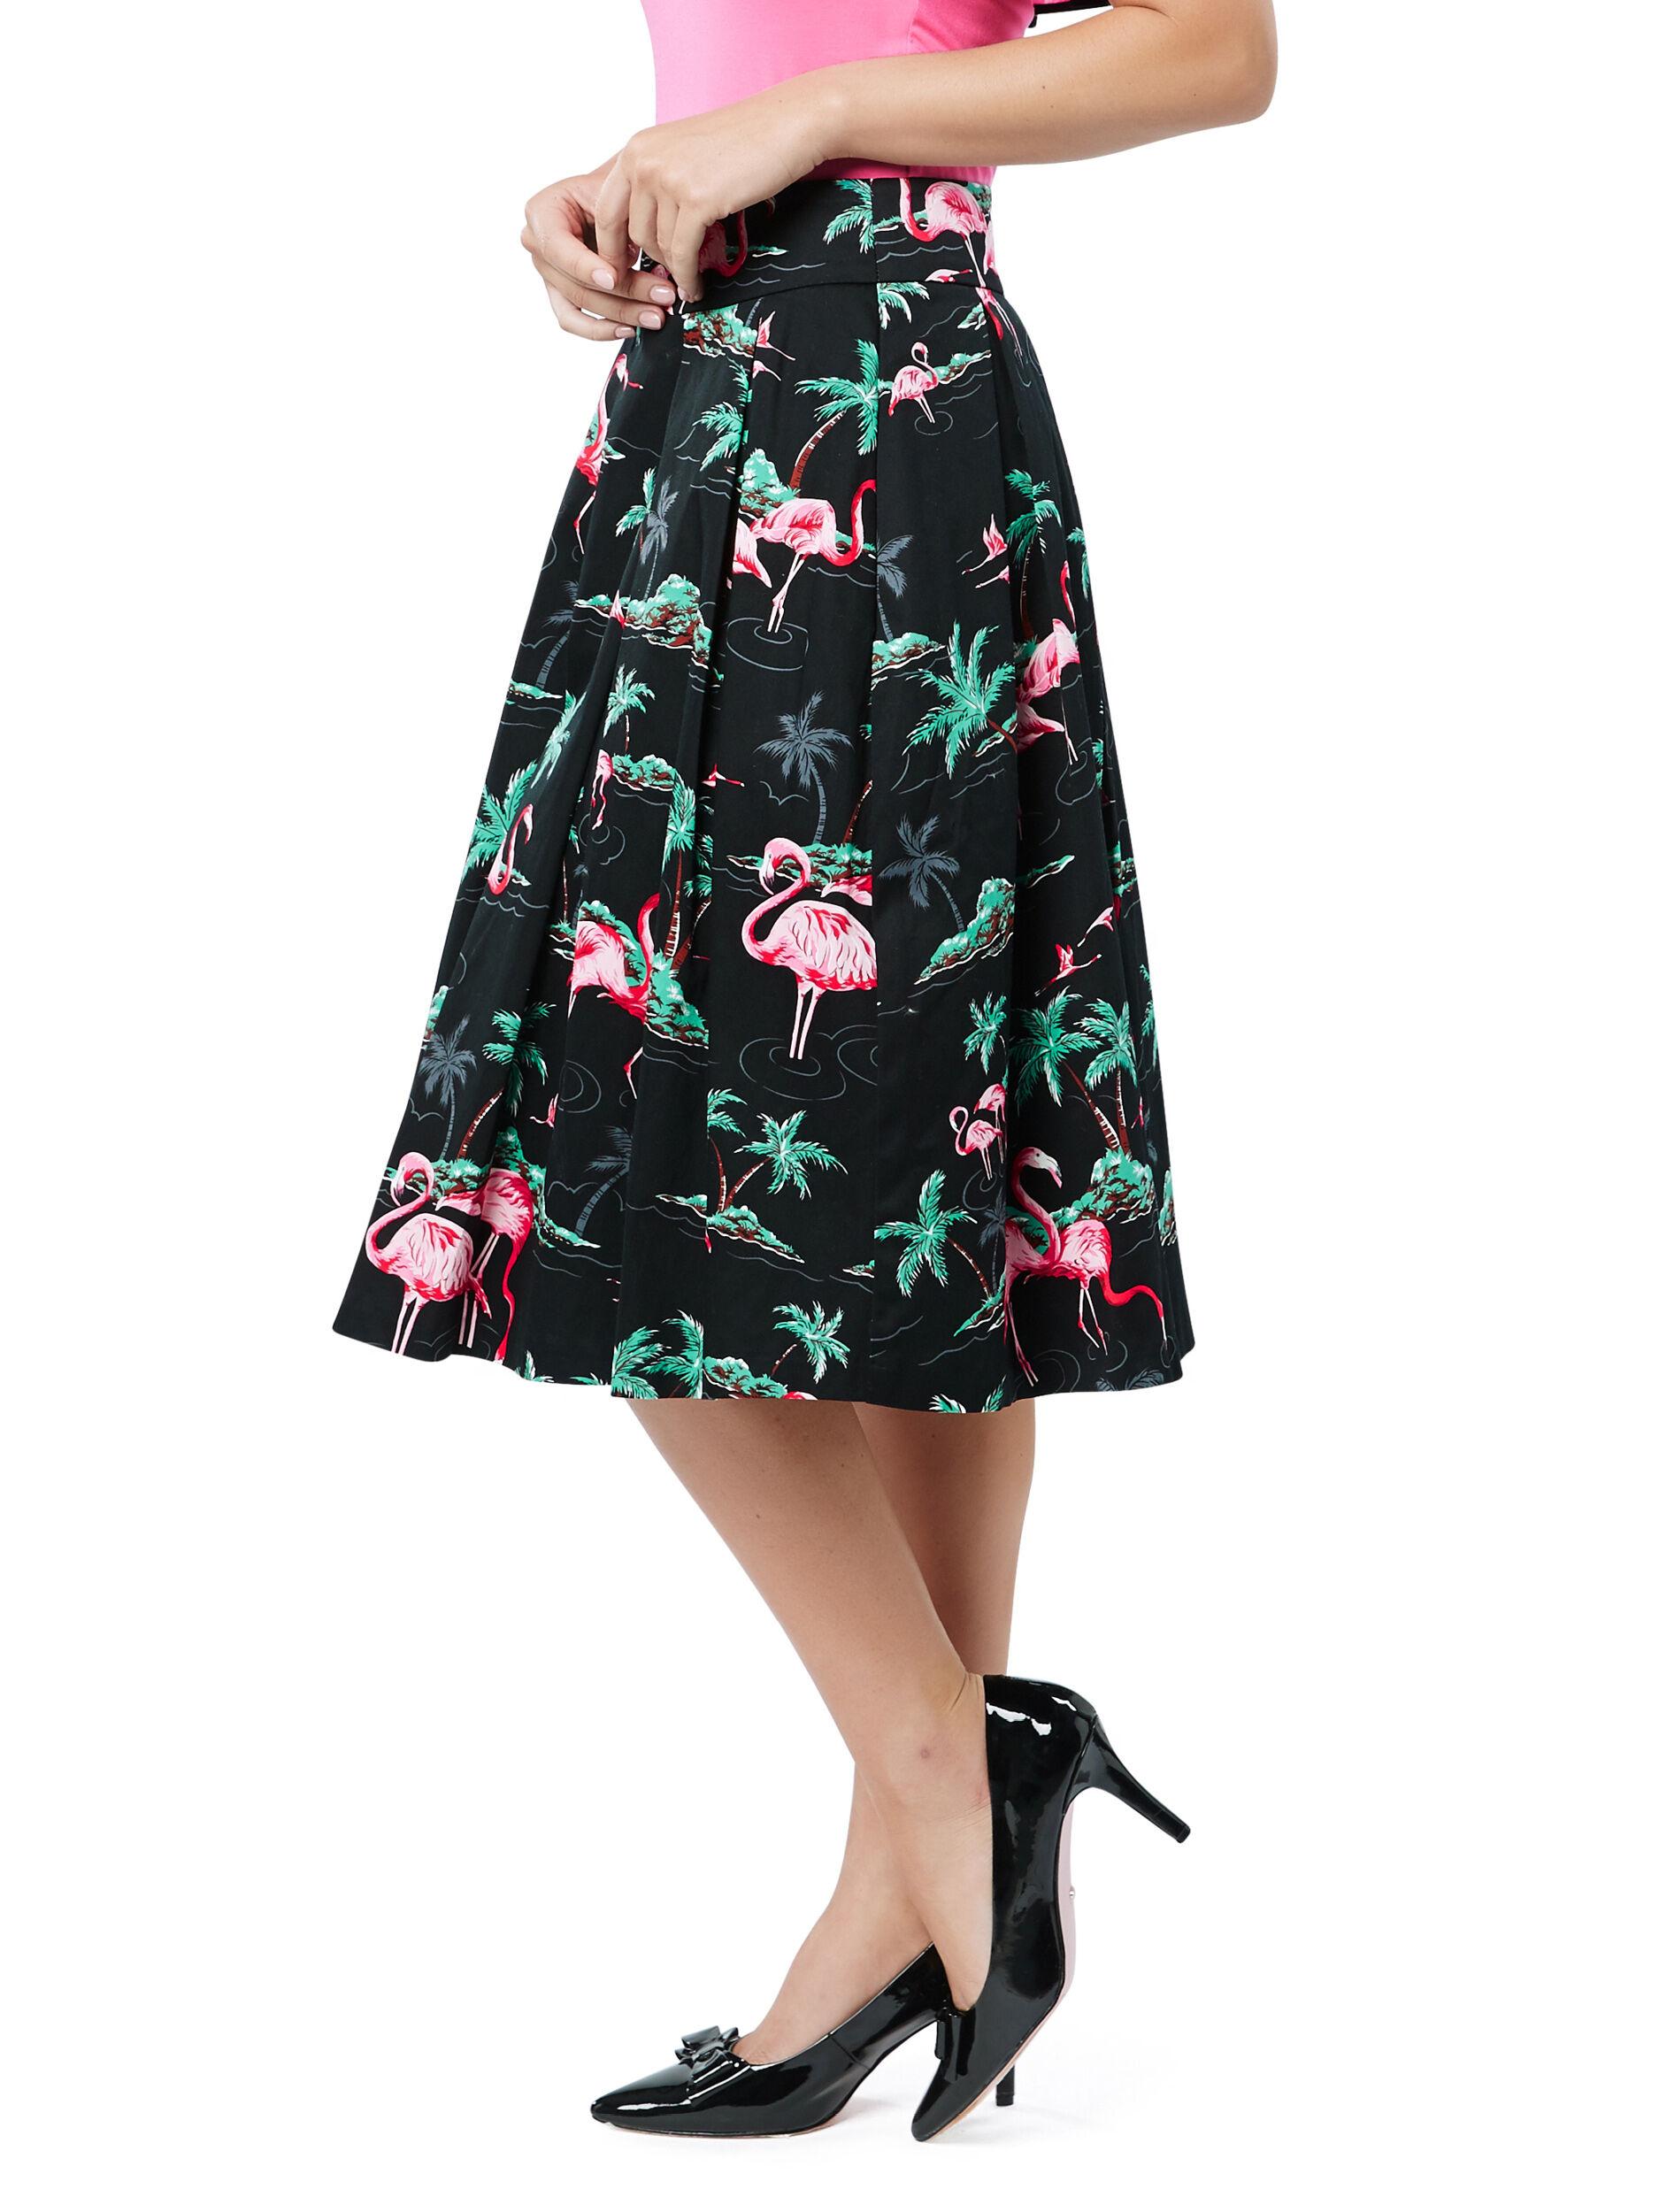 Palm Beach Prom Skirt